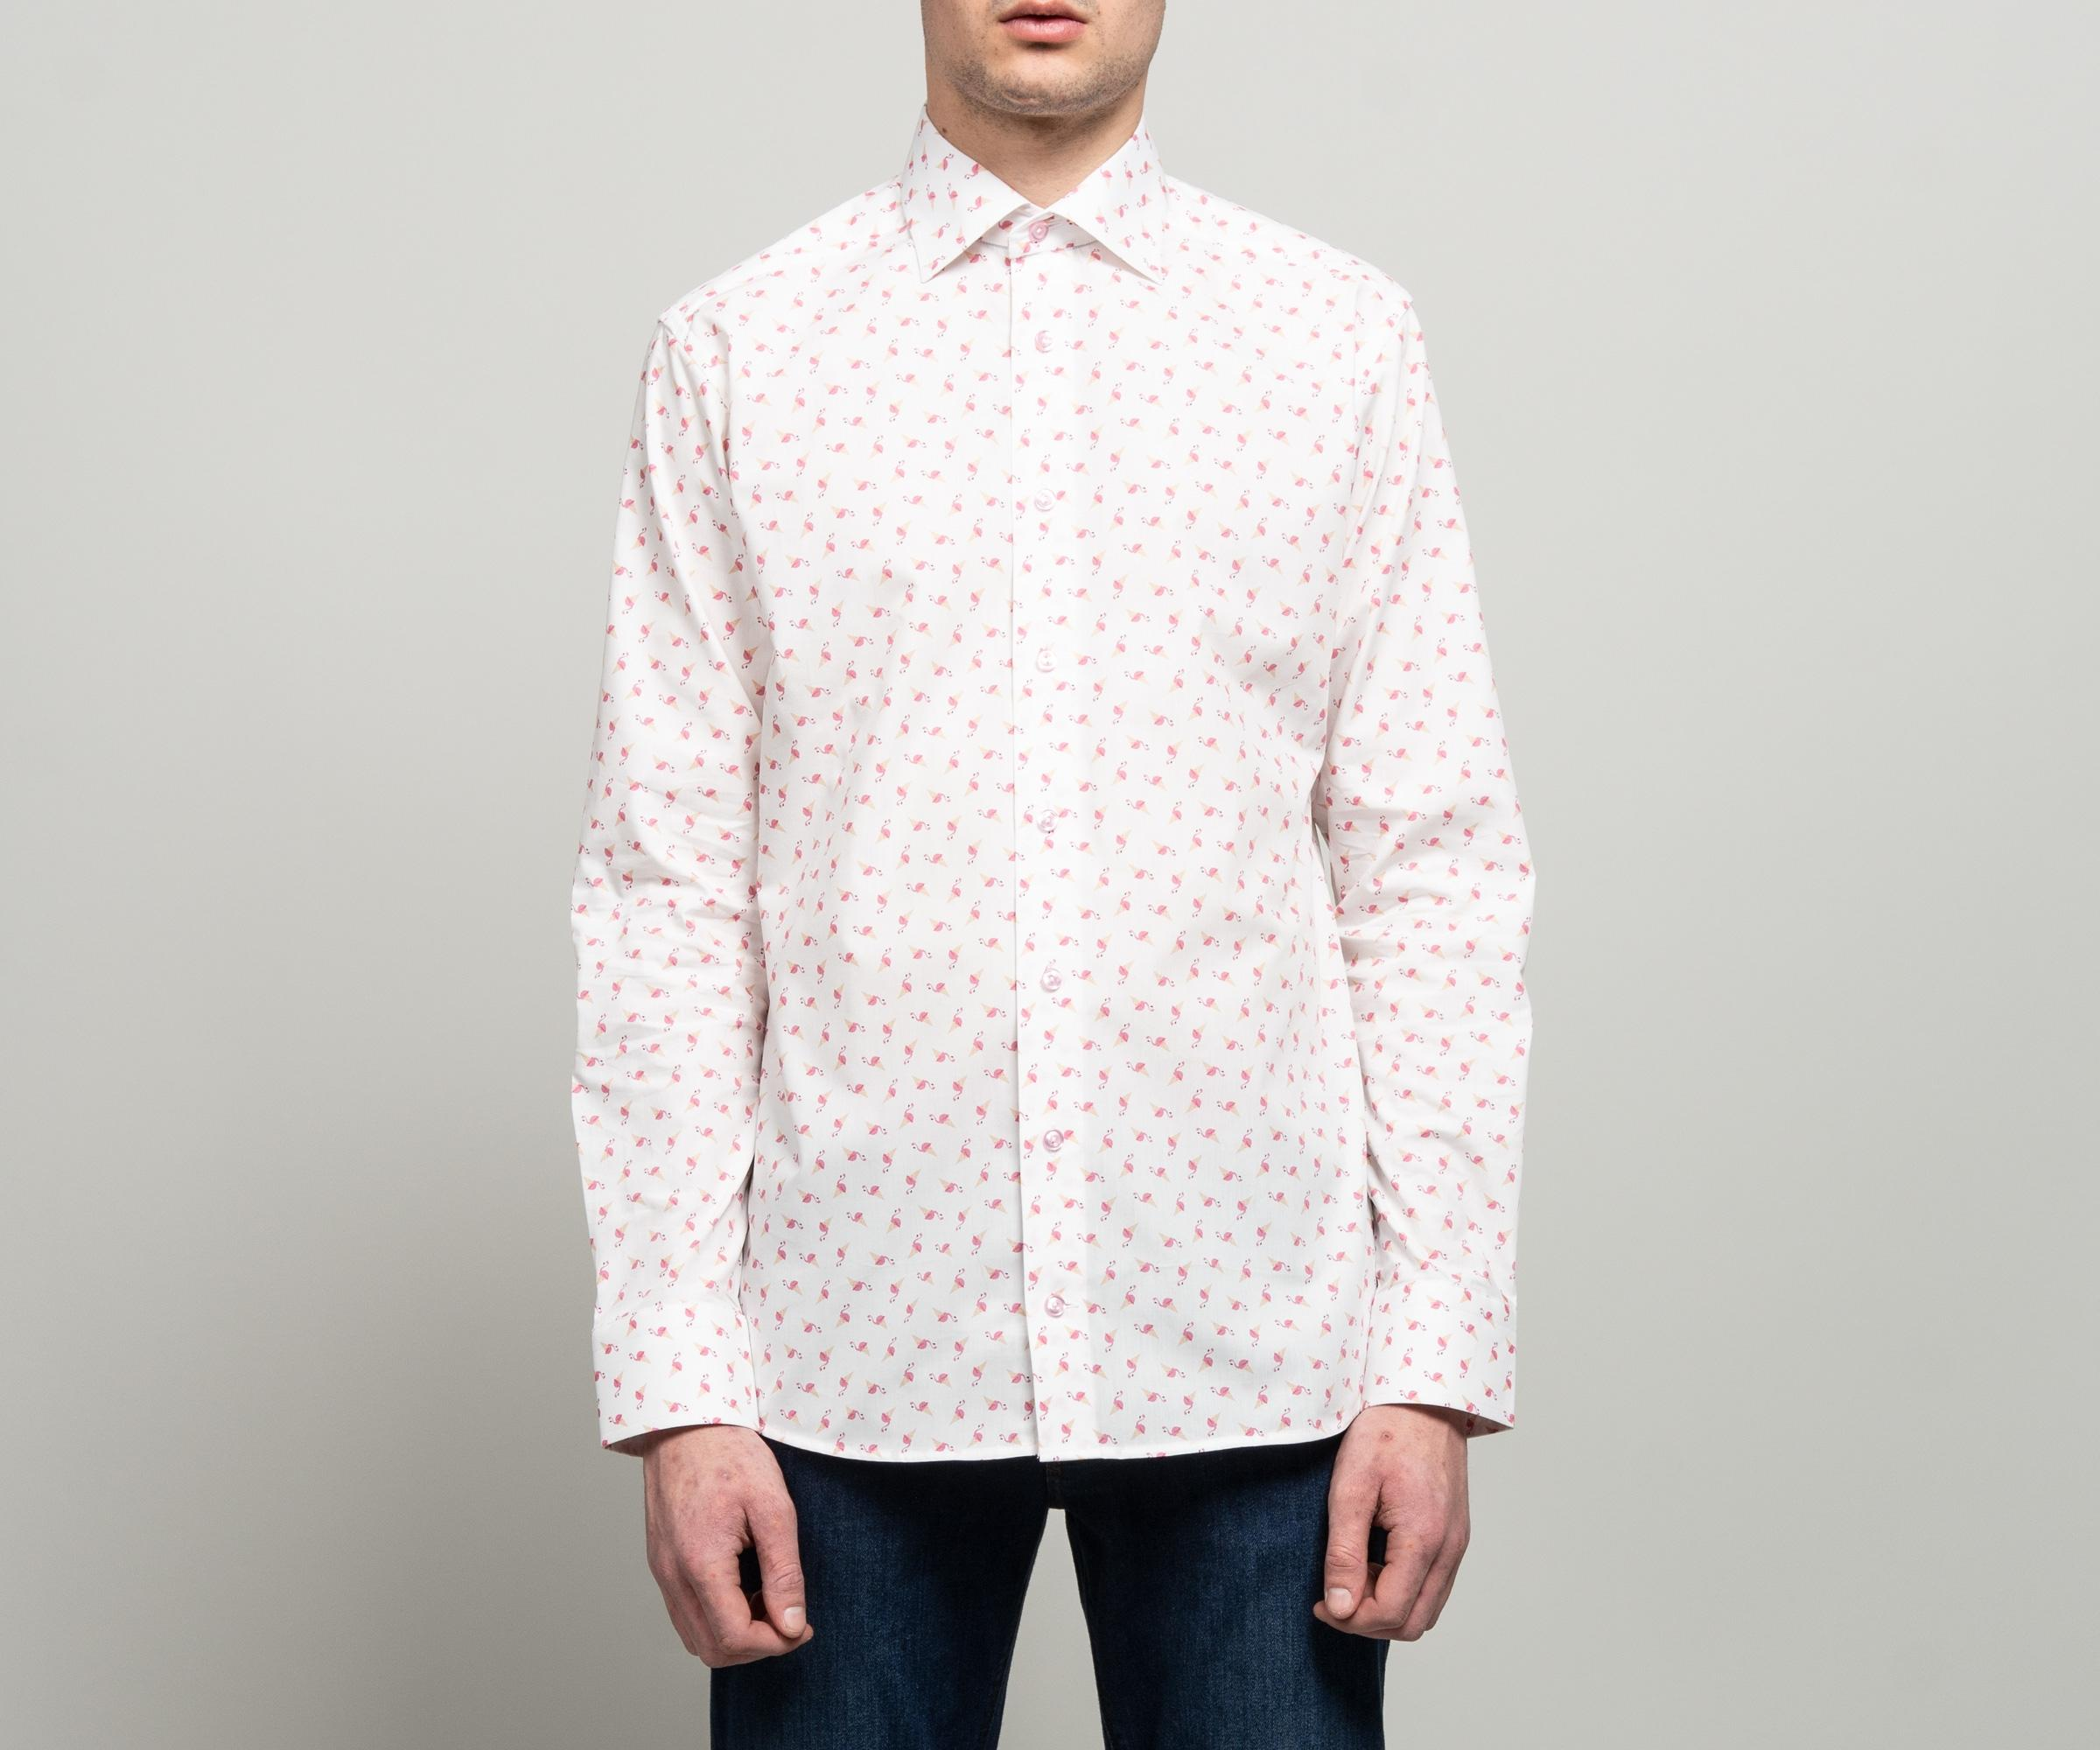 pipigo Mens Business Long Sleeve Slim Casual Lapel Button Up Dress Work Shirt